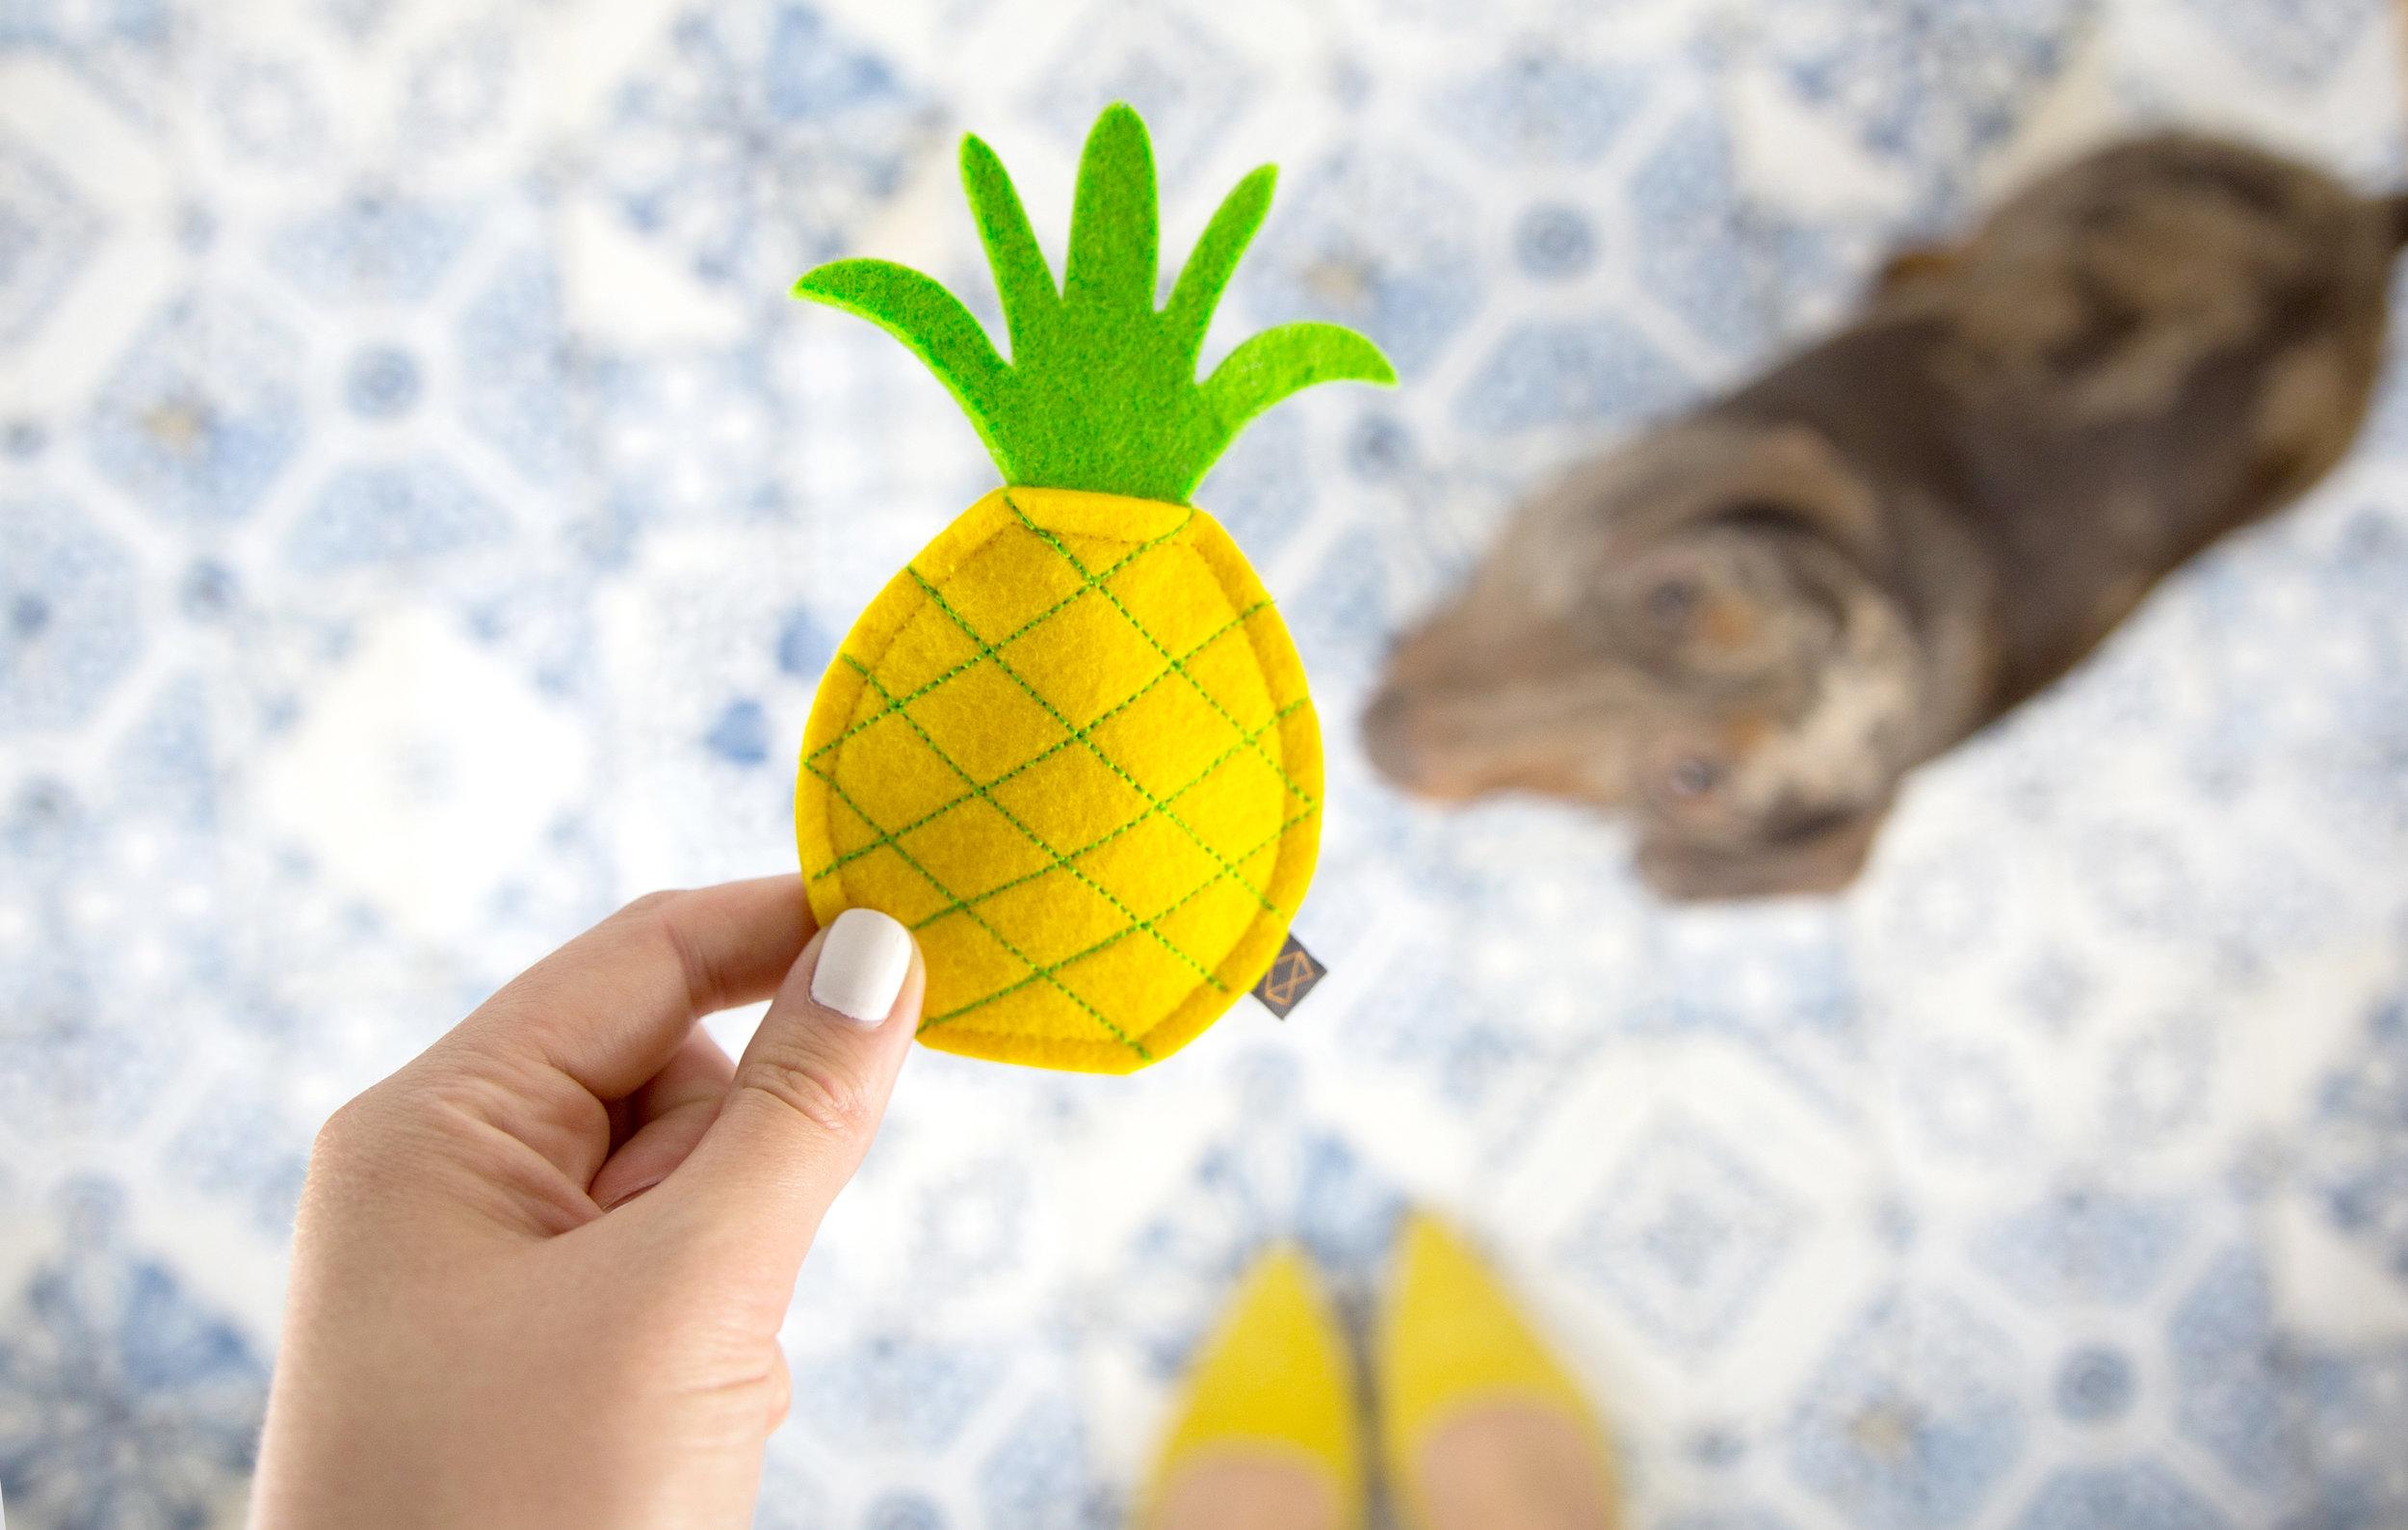 MODERNBEAST's  Puppy Pineapple Toy